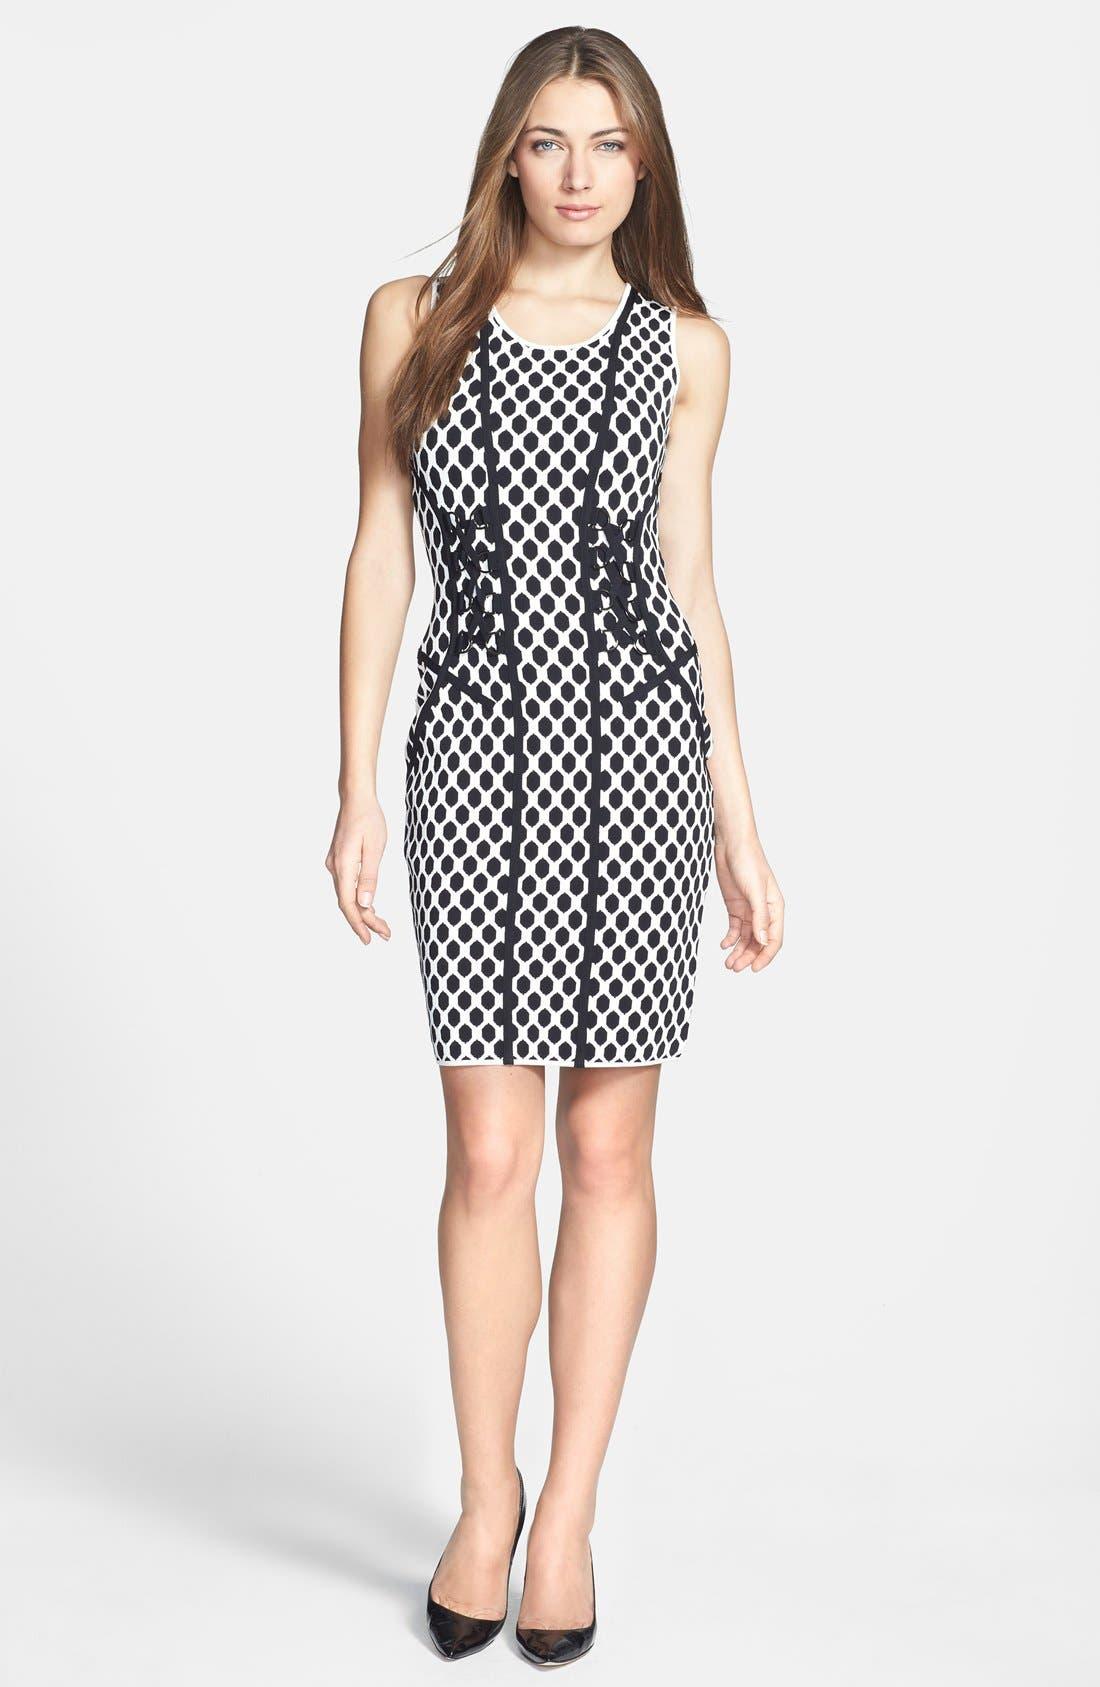 Main Image - Diane von Furstenberg 'Lusaka' Knit Body-Con Dress